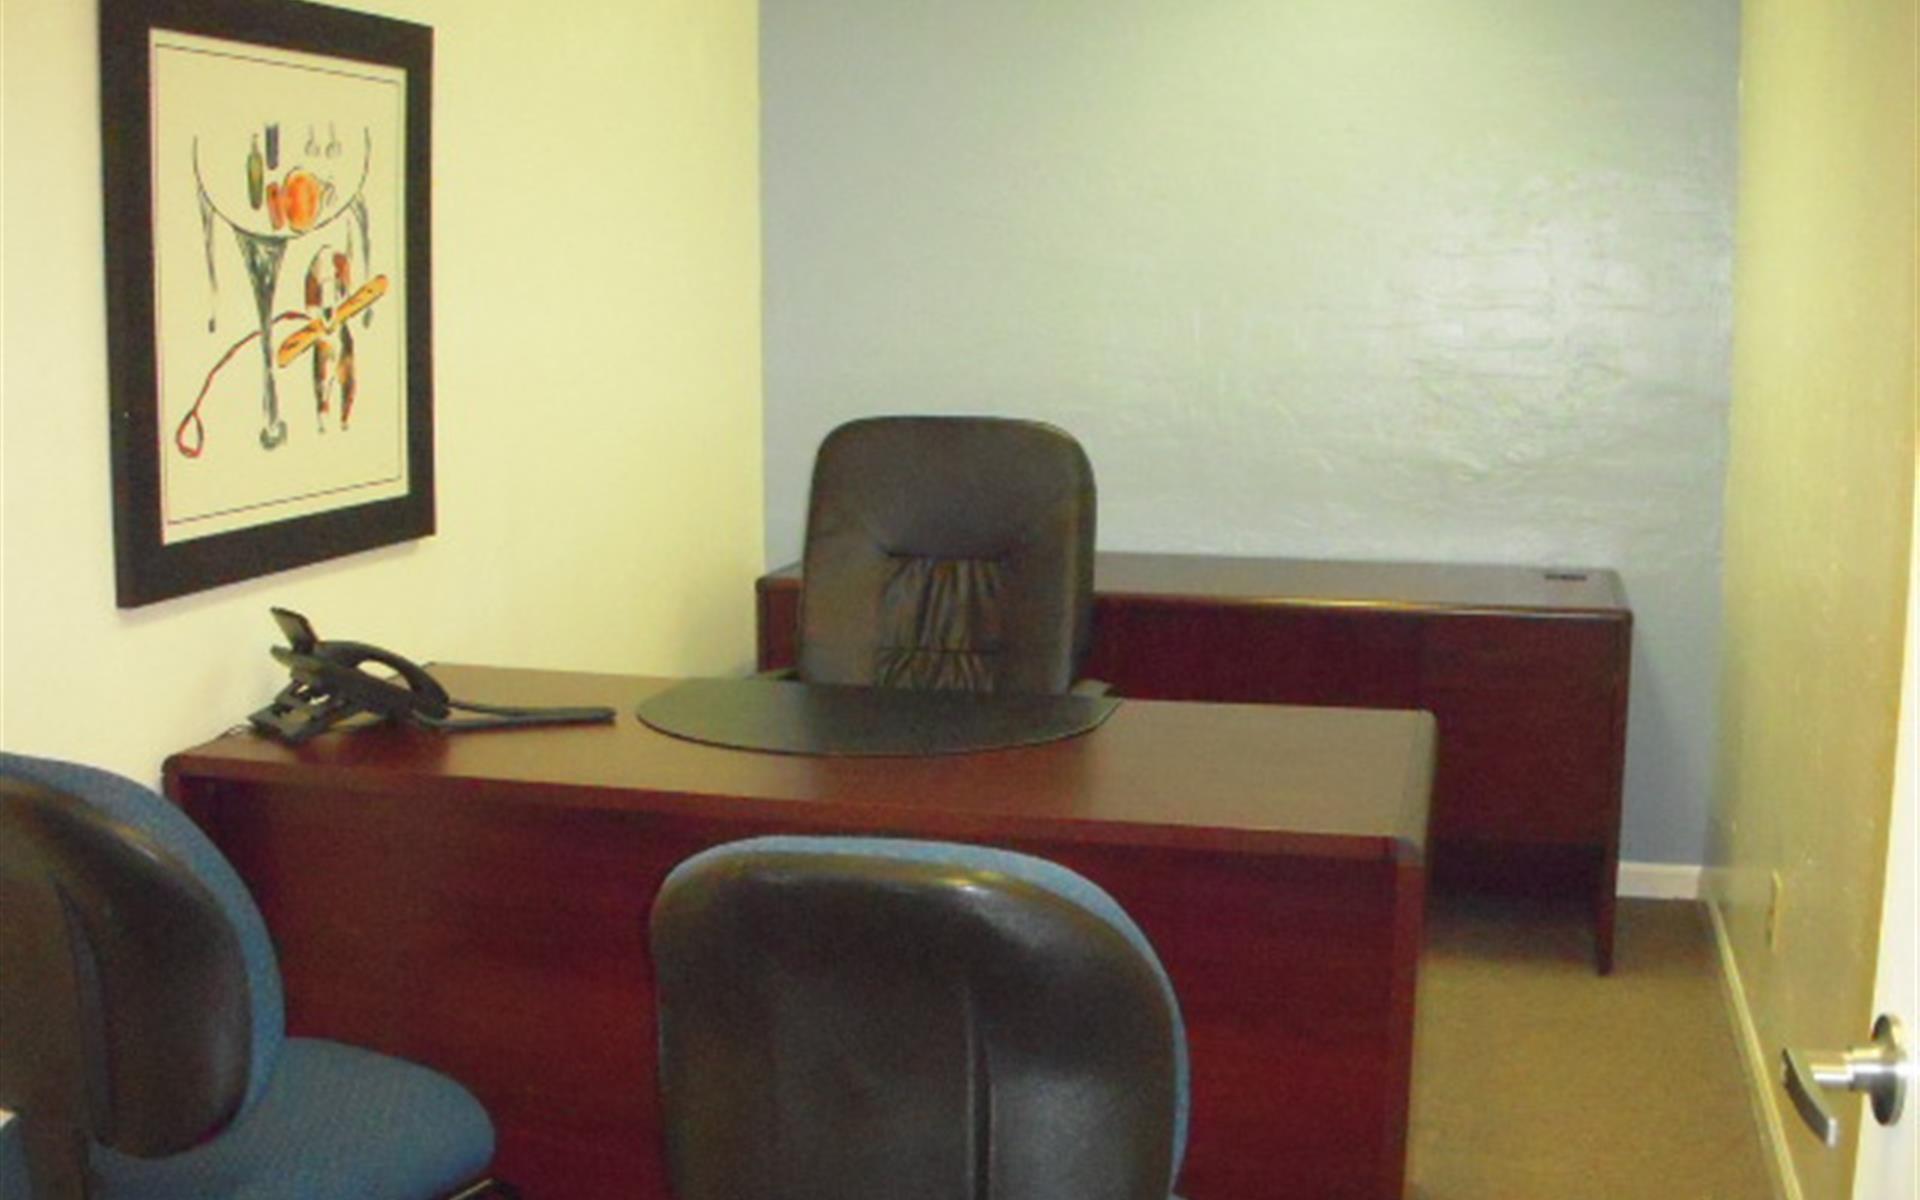 Plaza Executive Suites Mesa Office Plaza - Fiesta Office